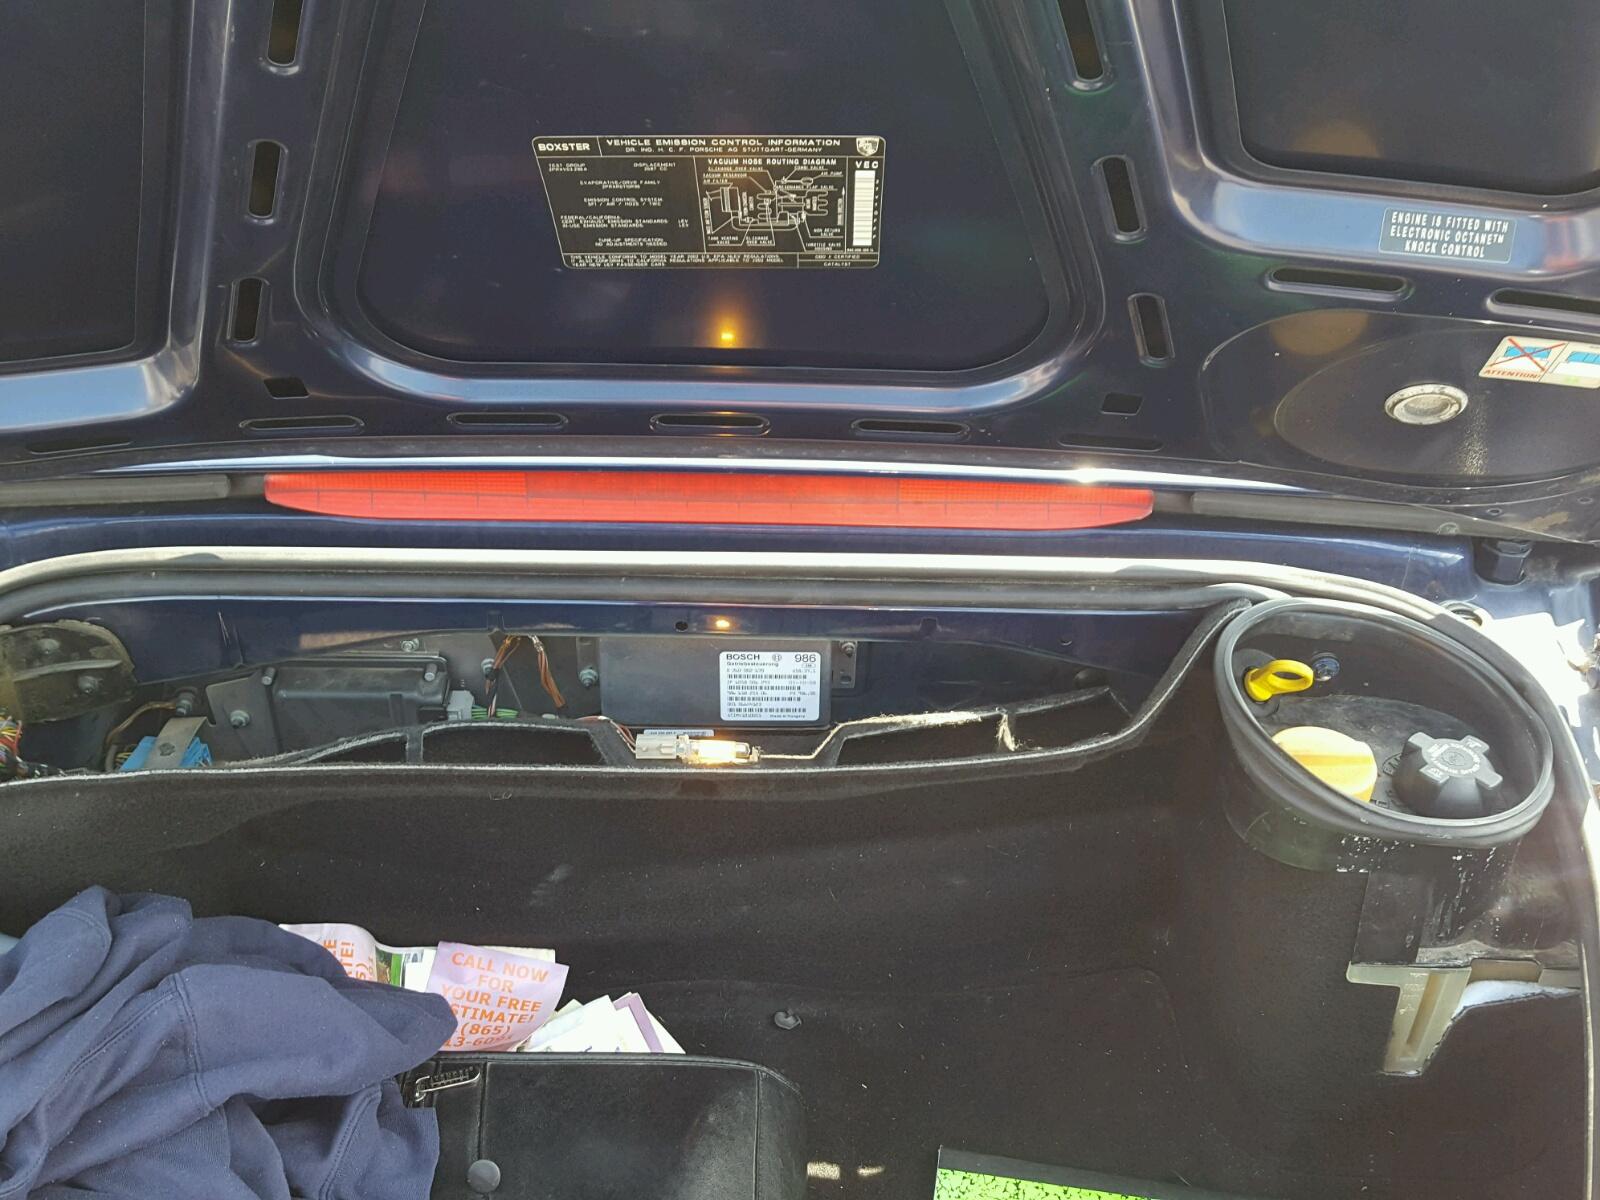 Wp0ca29832u622117 2002 Blue Porsche Boxster On Sale In Co Denver Engine Vacuum Diagram 27l Inside View